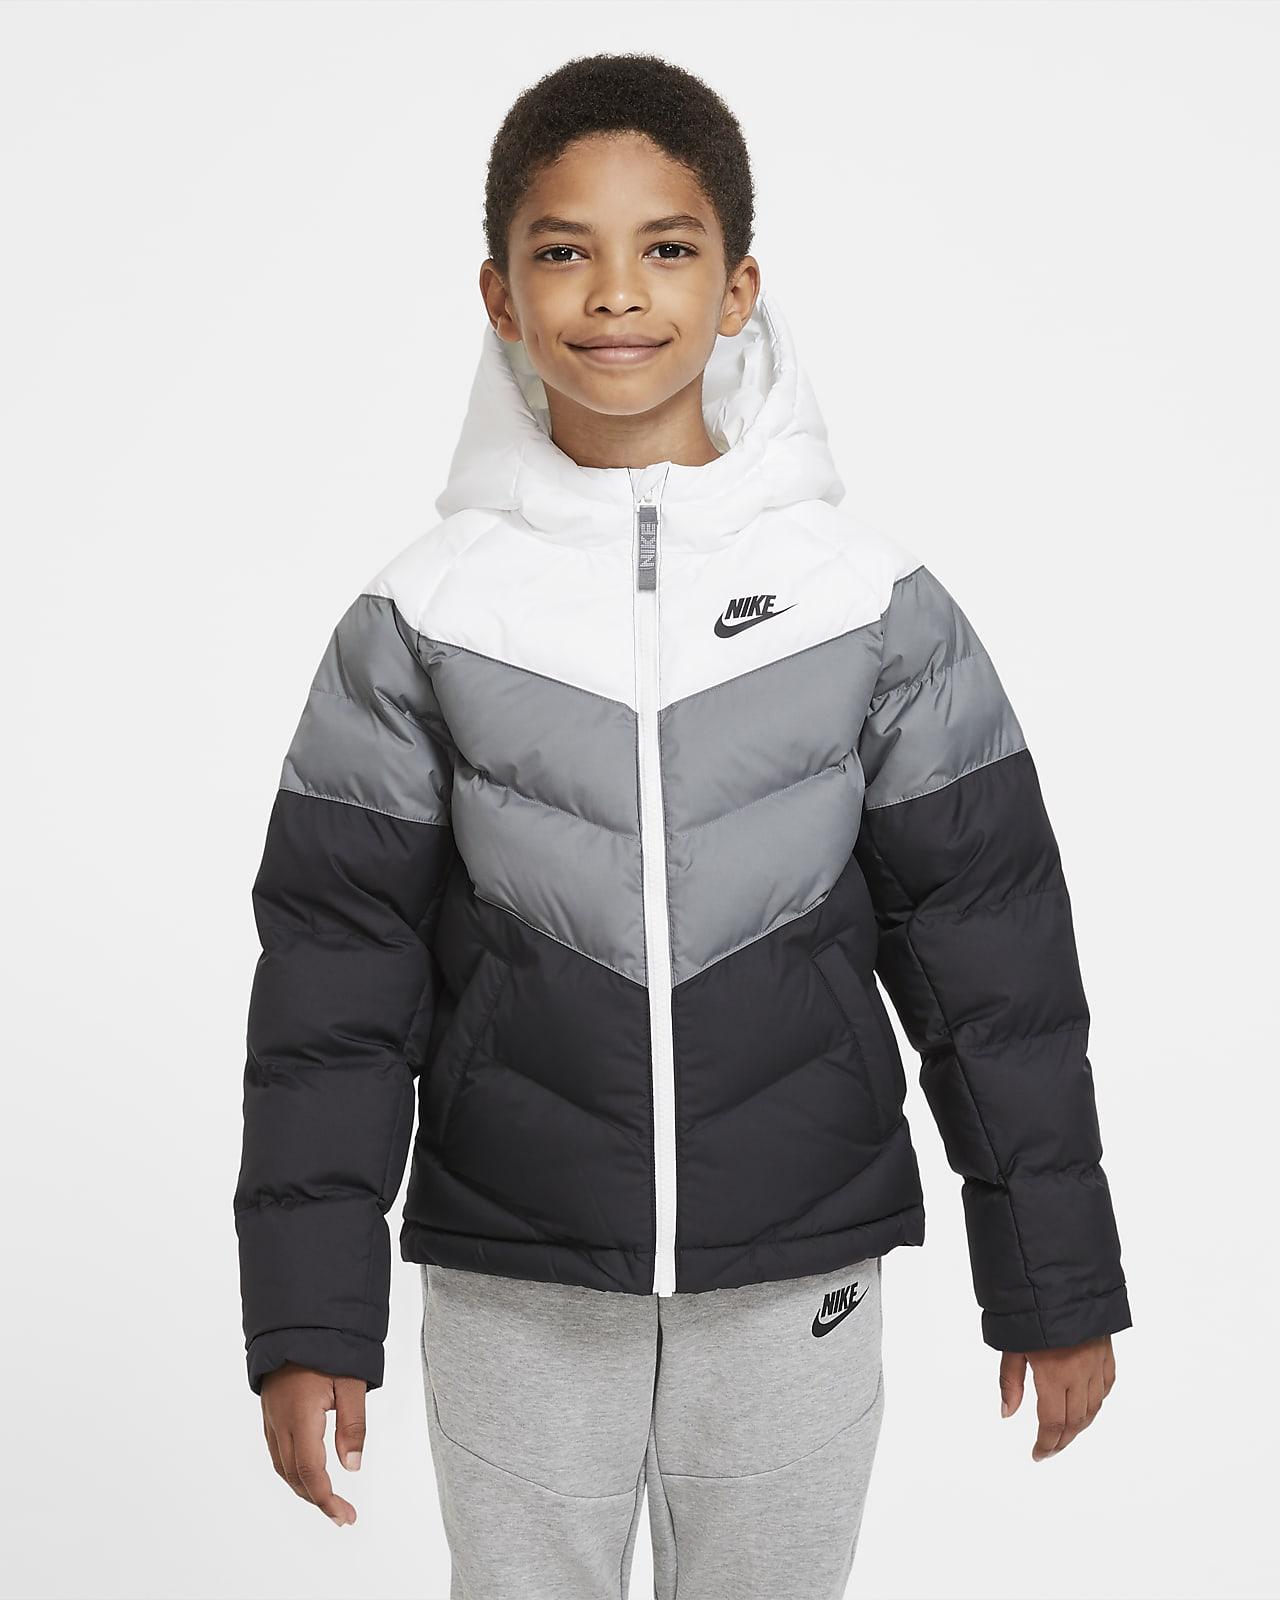 Giacca con imbottitura sintetica Nike Sportswear - Ragazzi